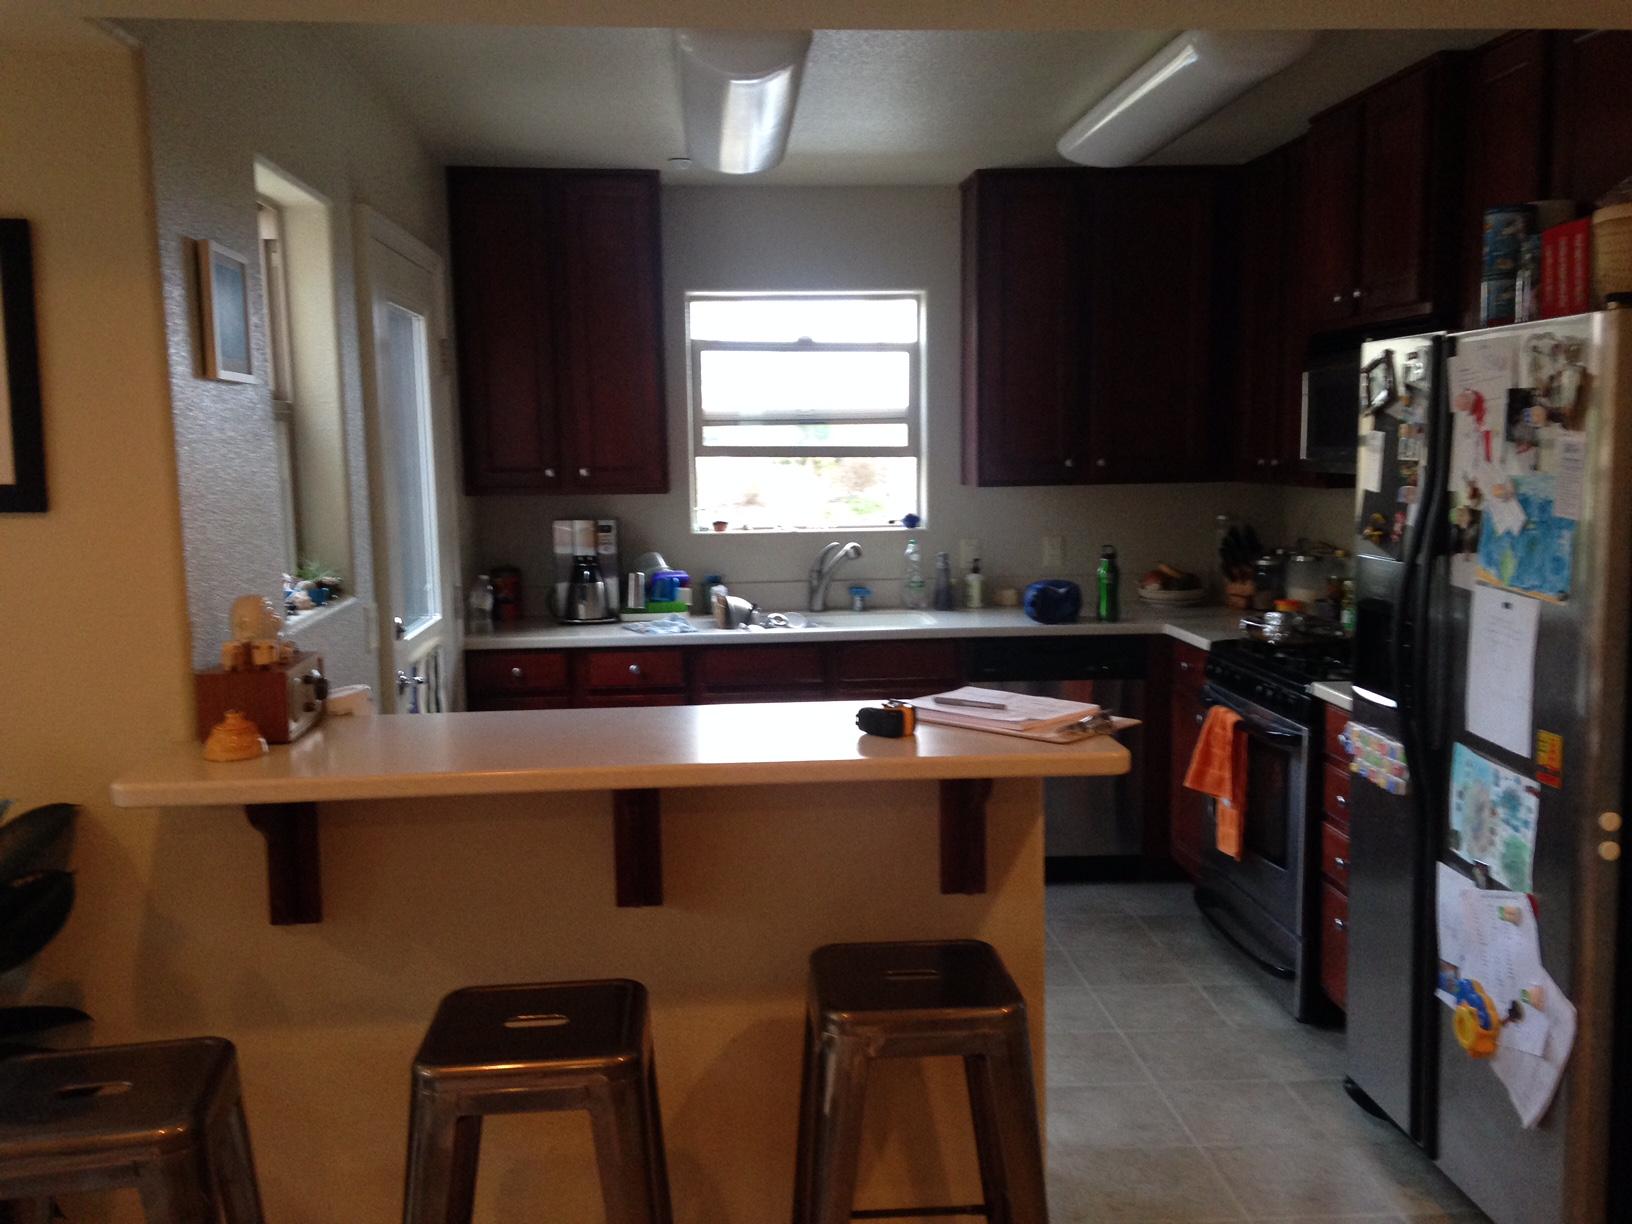 Morro Bay Kitchen Renovation: Before